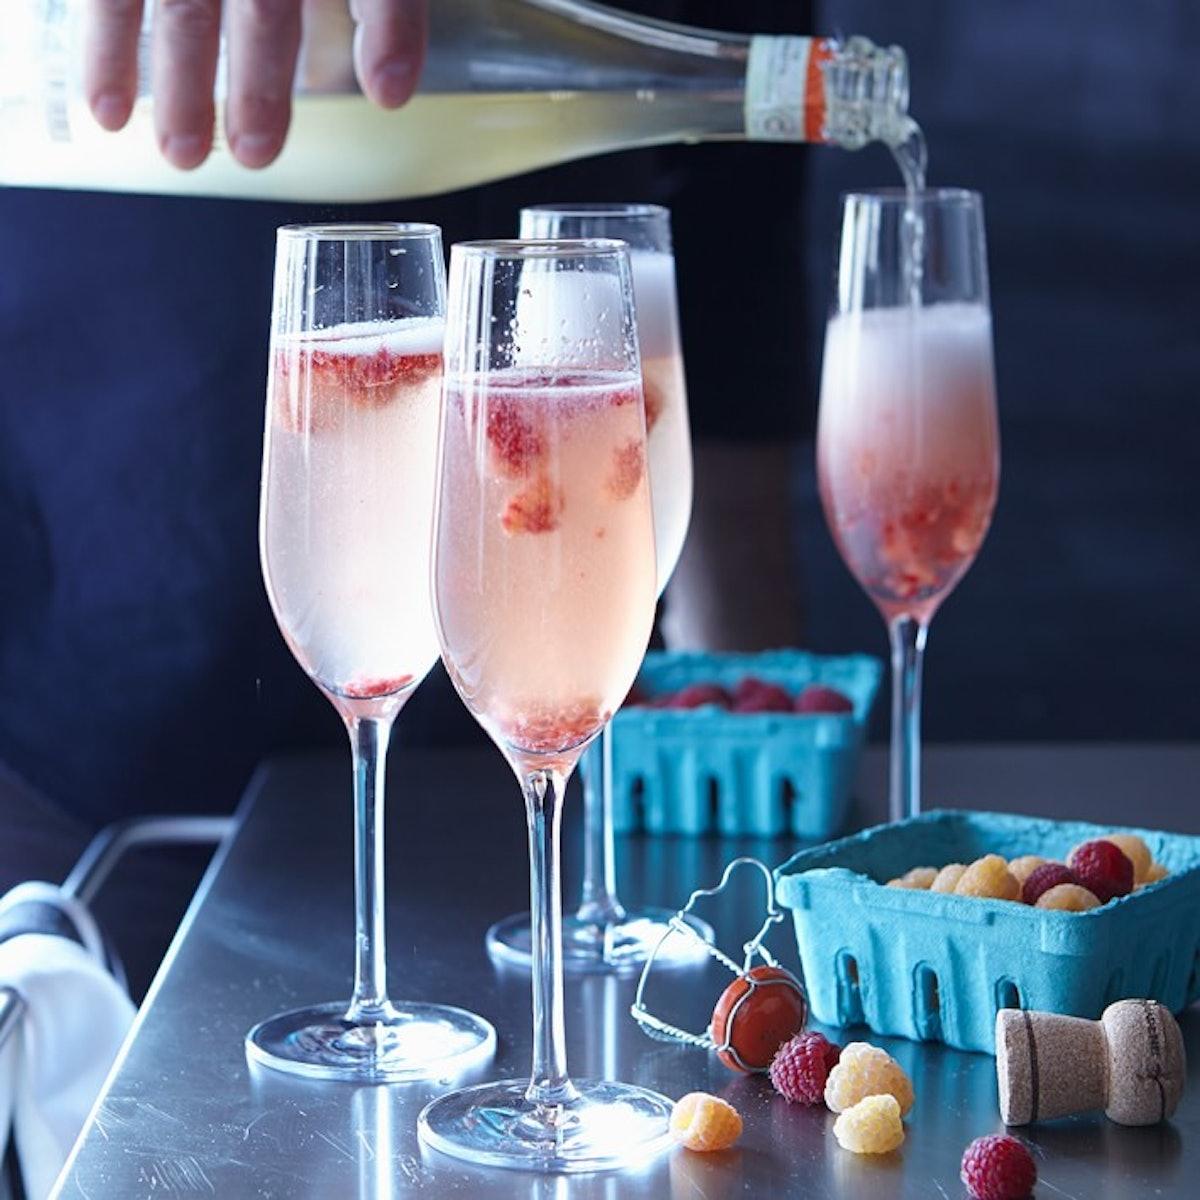 Williams Sonoma Open Kitchen Champagne Flutes, Set of 4